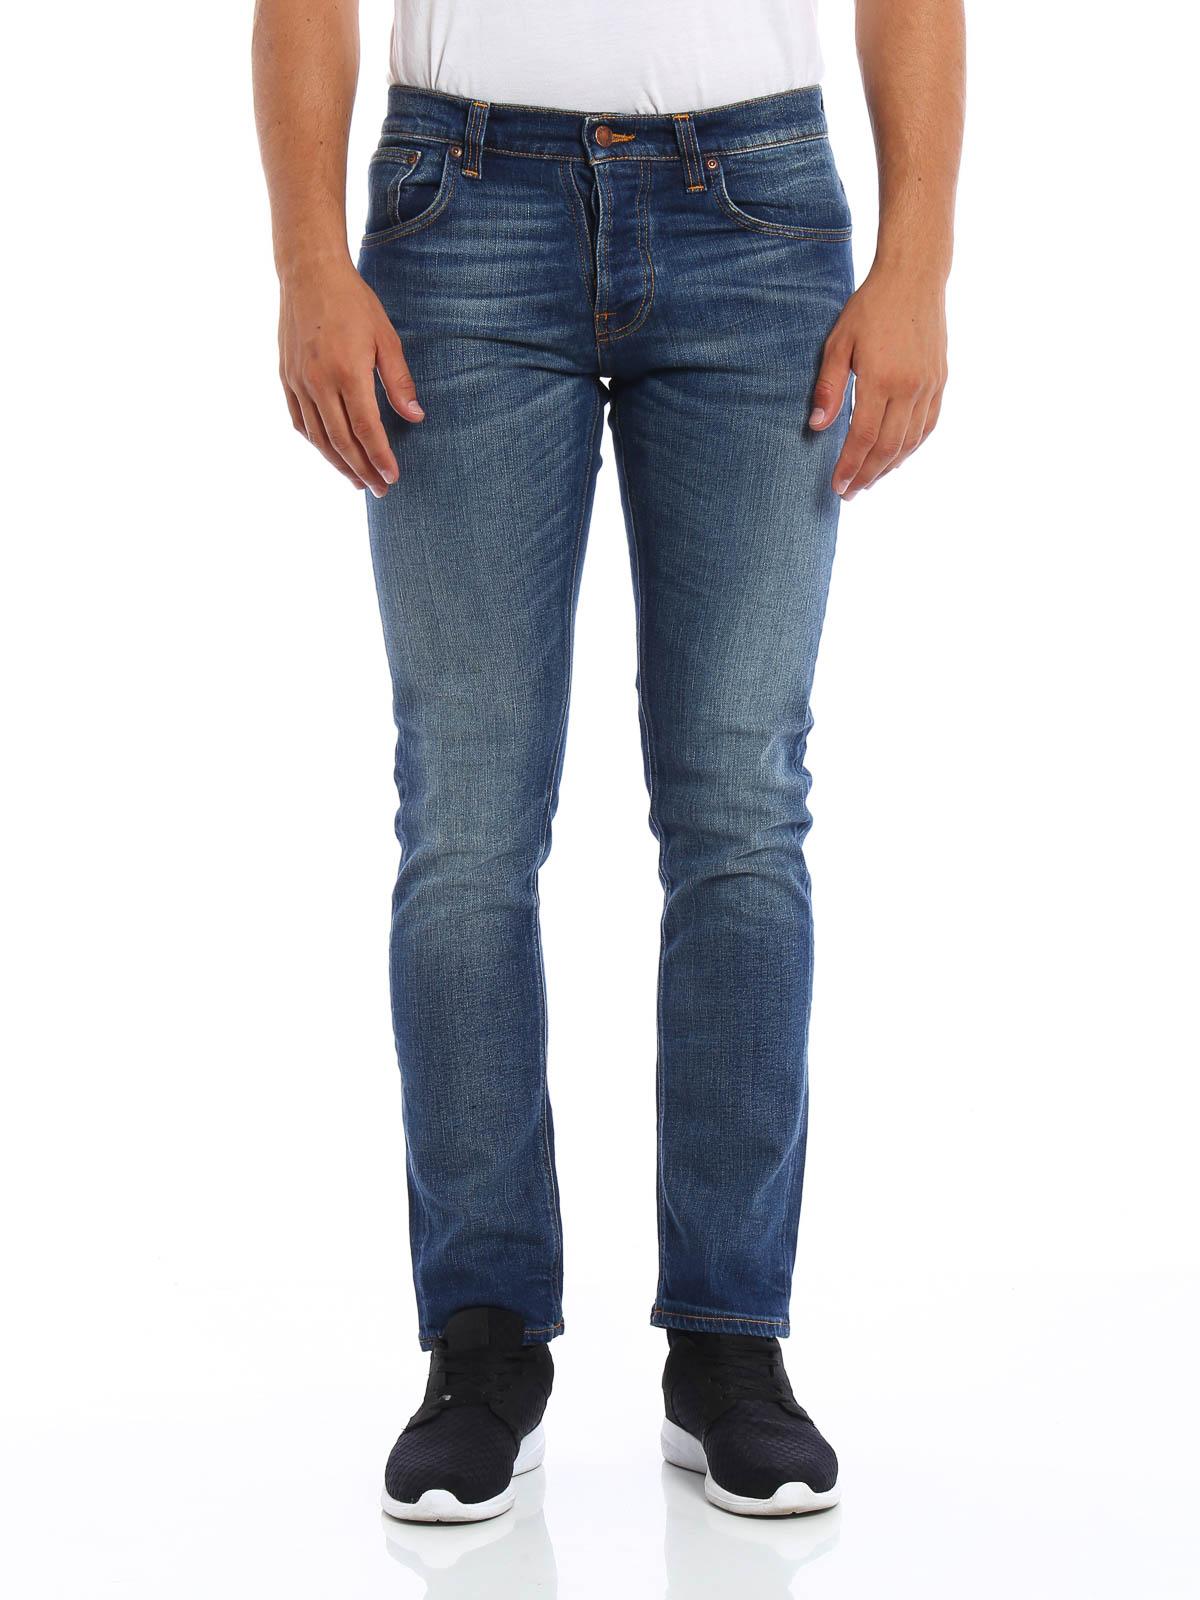 grim tim jeans by nudie jeans straight leg jeans shop online at. Black Bedroom Furniture Sets. Home Design Ideas